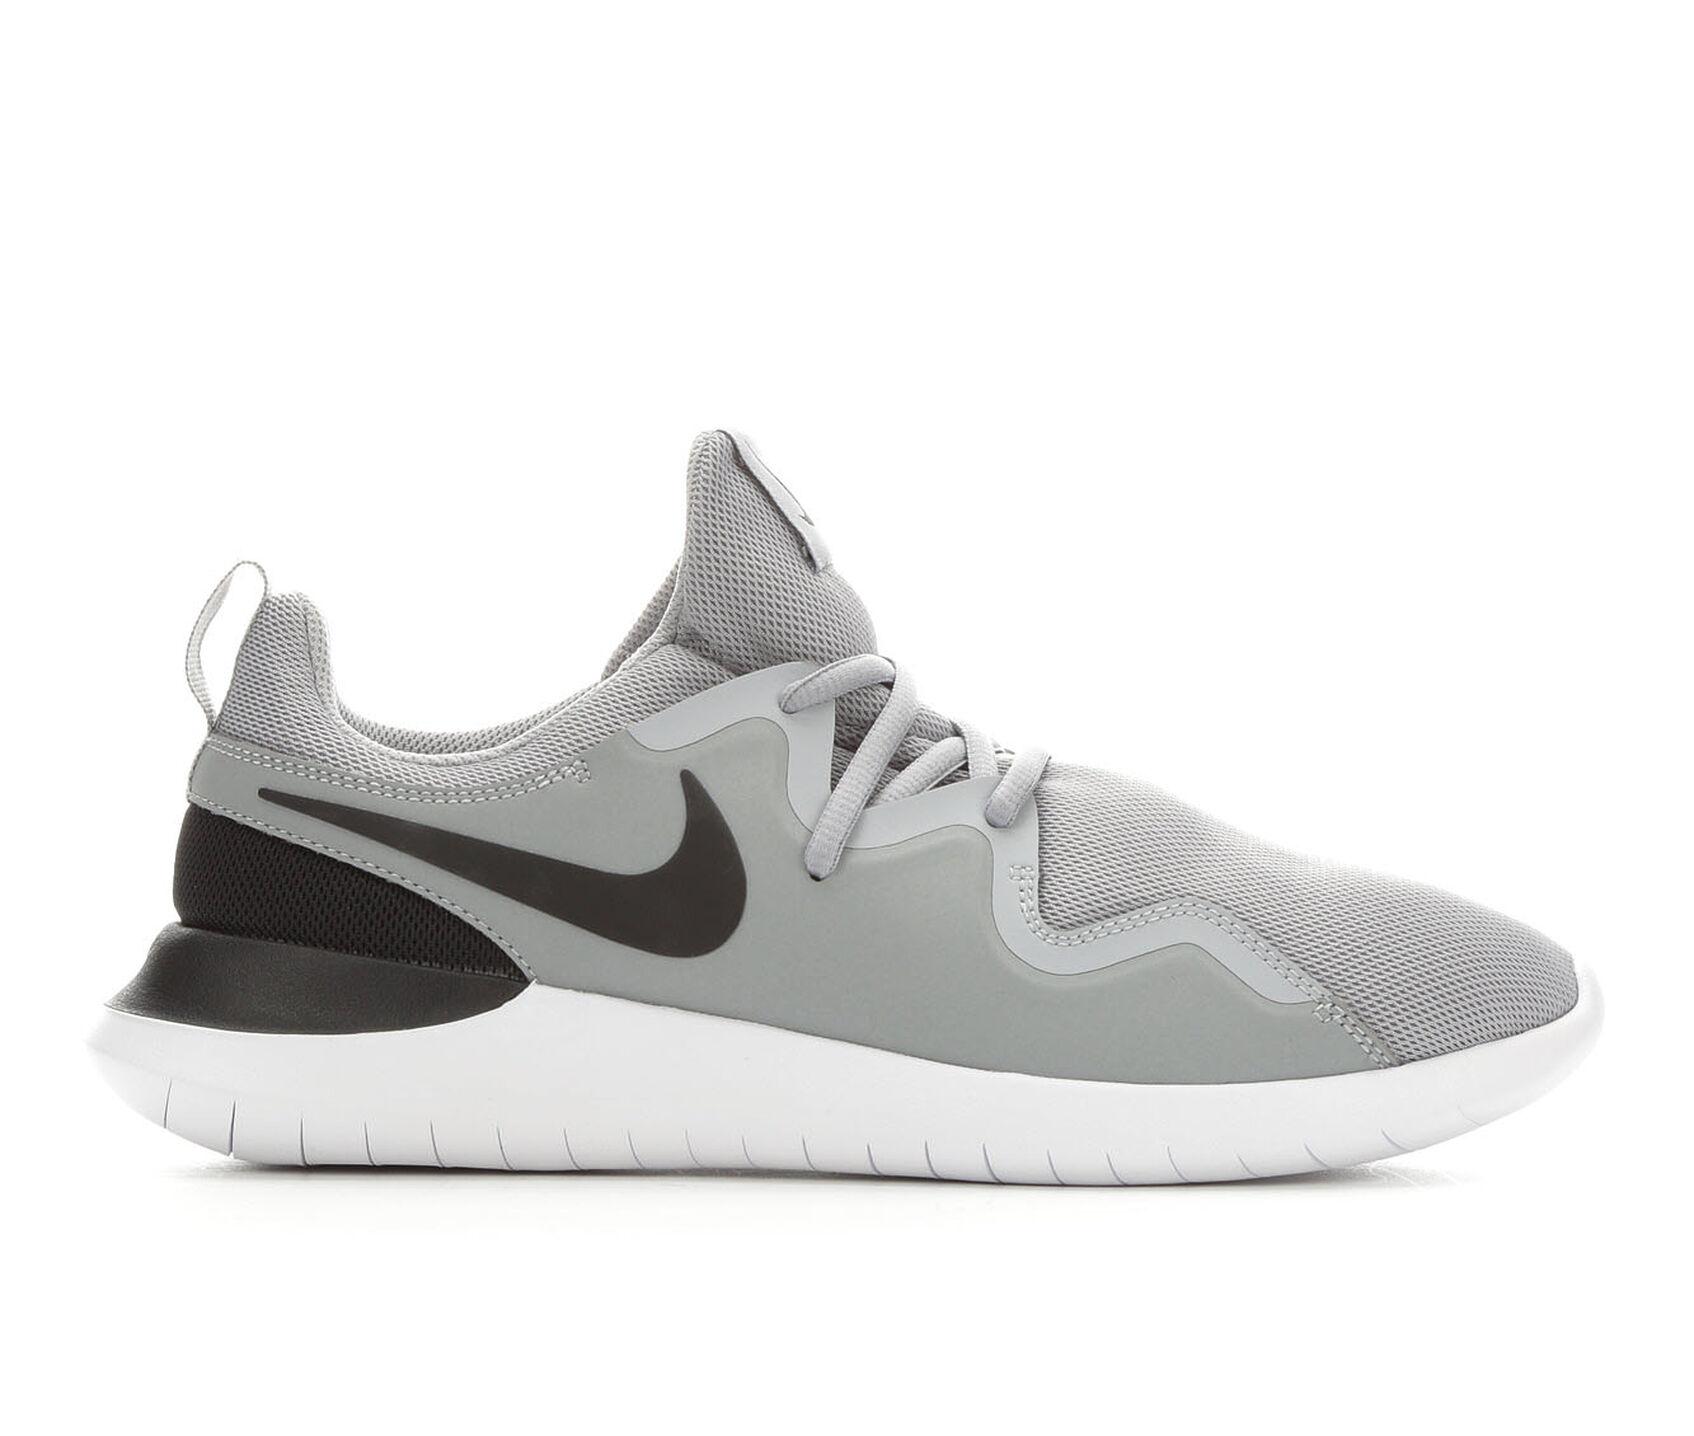 baad08d5beb ... Nike Tessen Sneakers. Previous